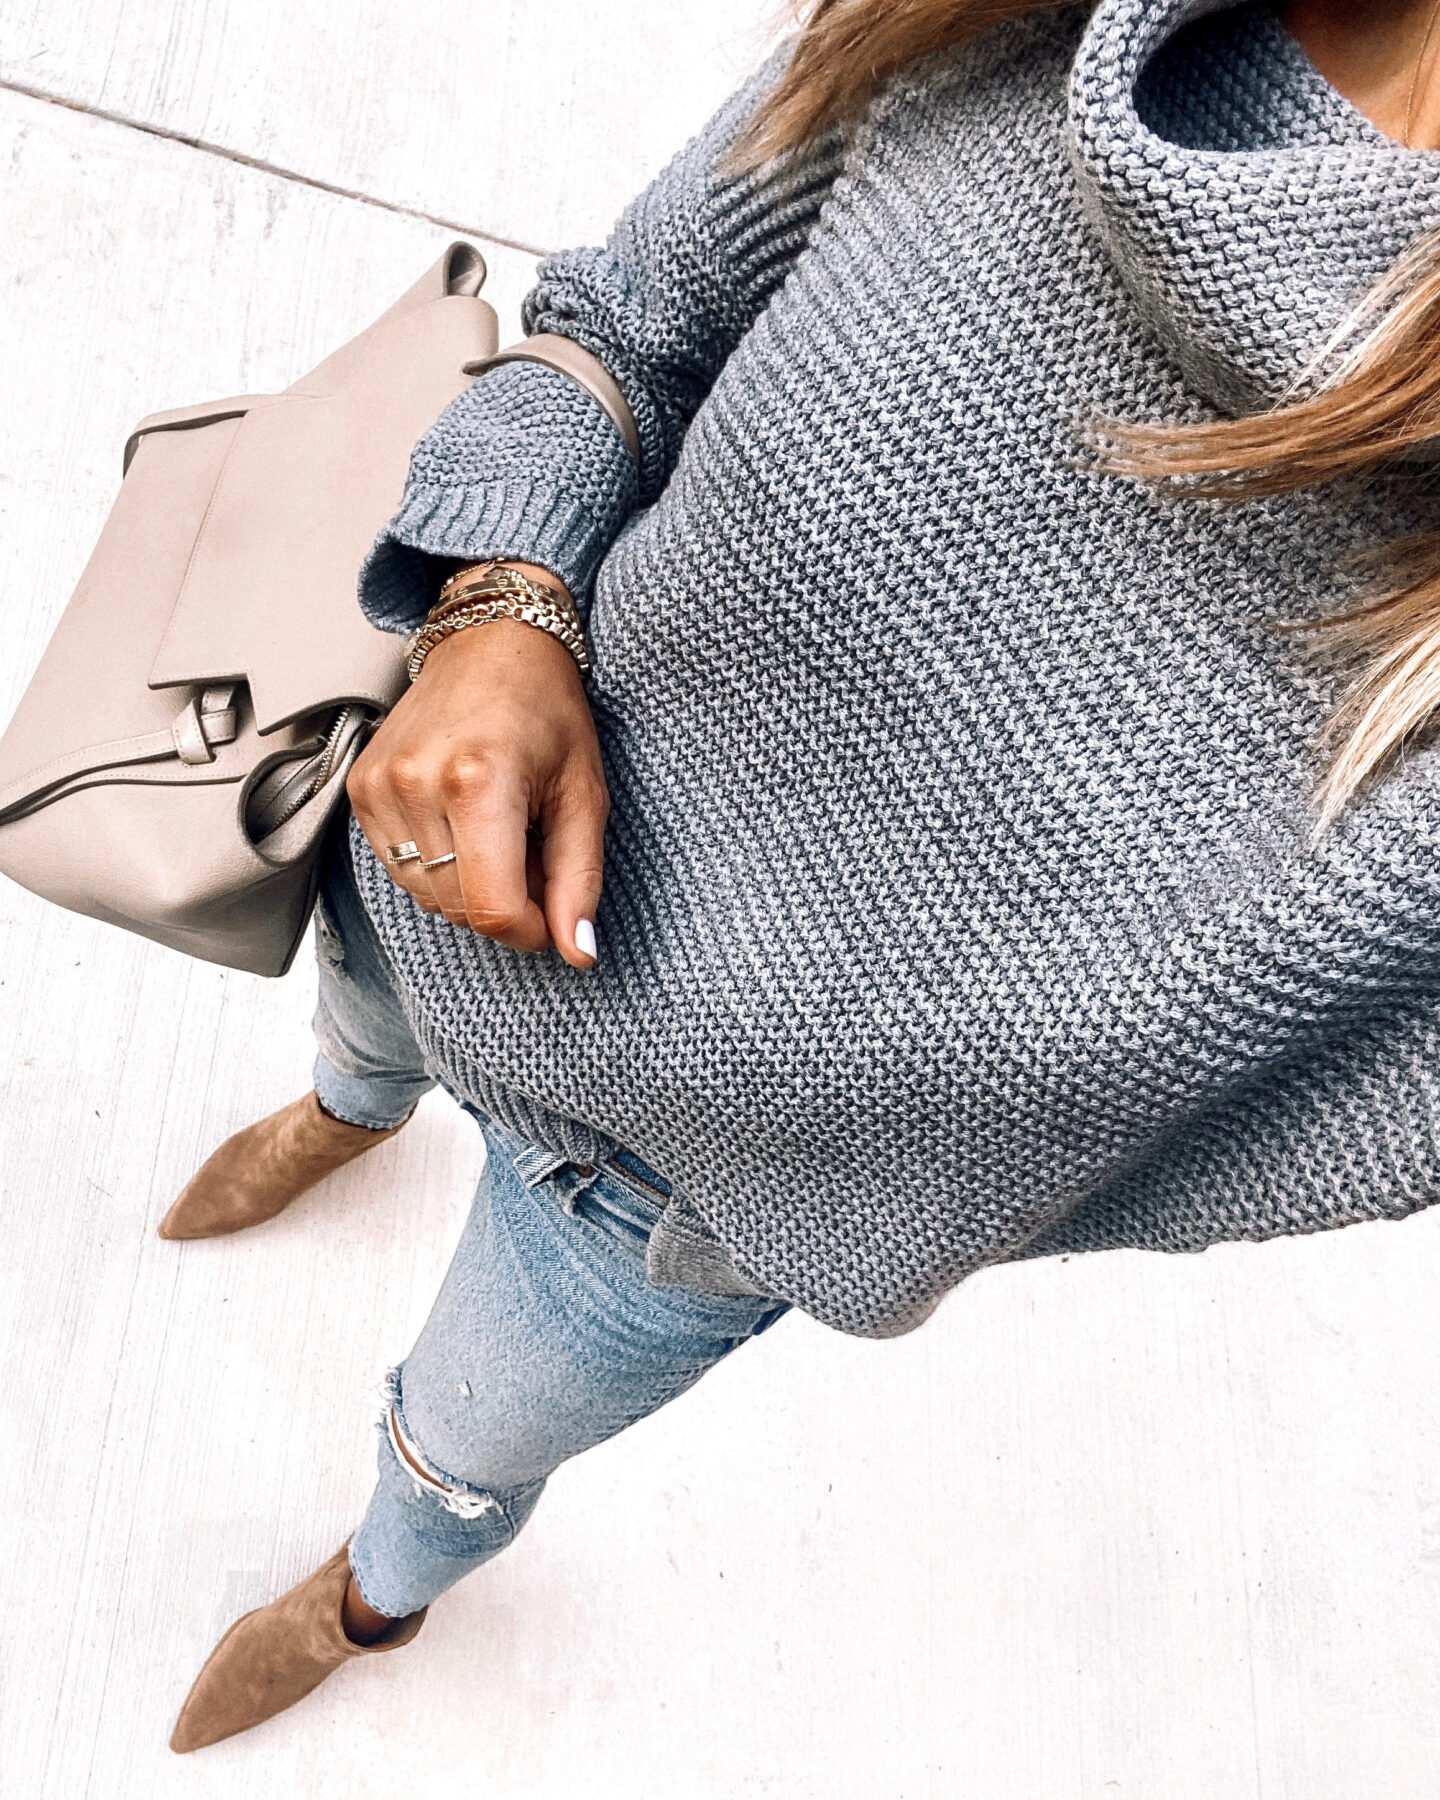 Fashion Jackson Amazon Fashion Grey Sweater Ripped Jeans Booties